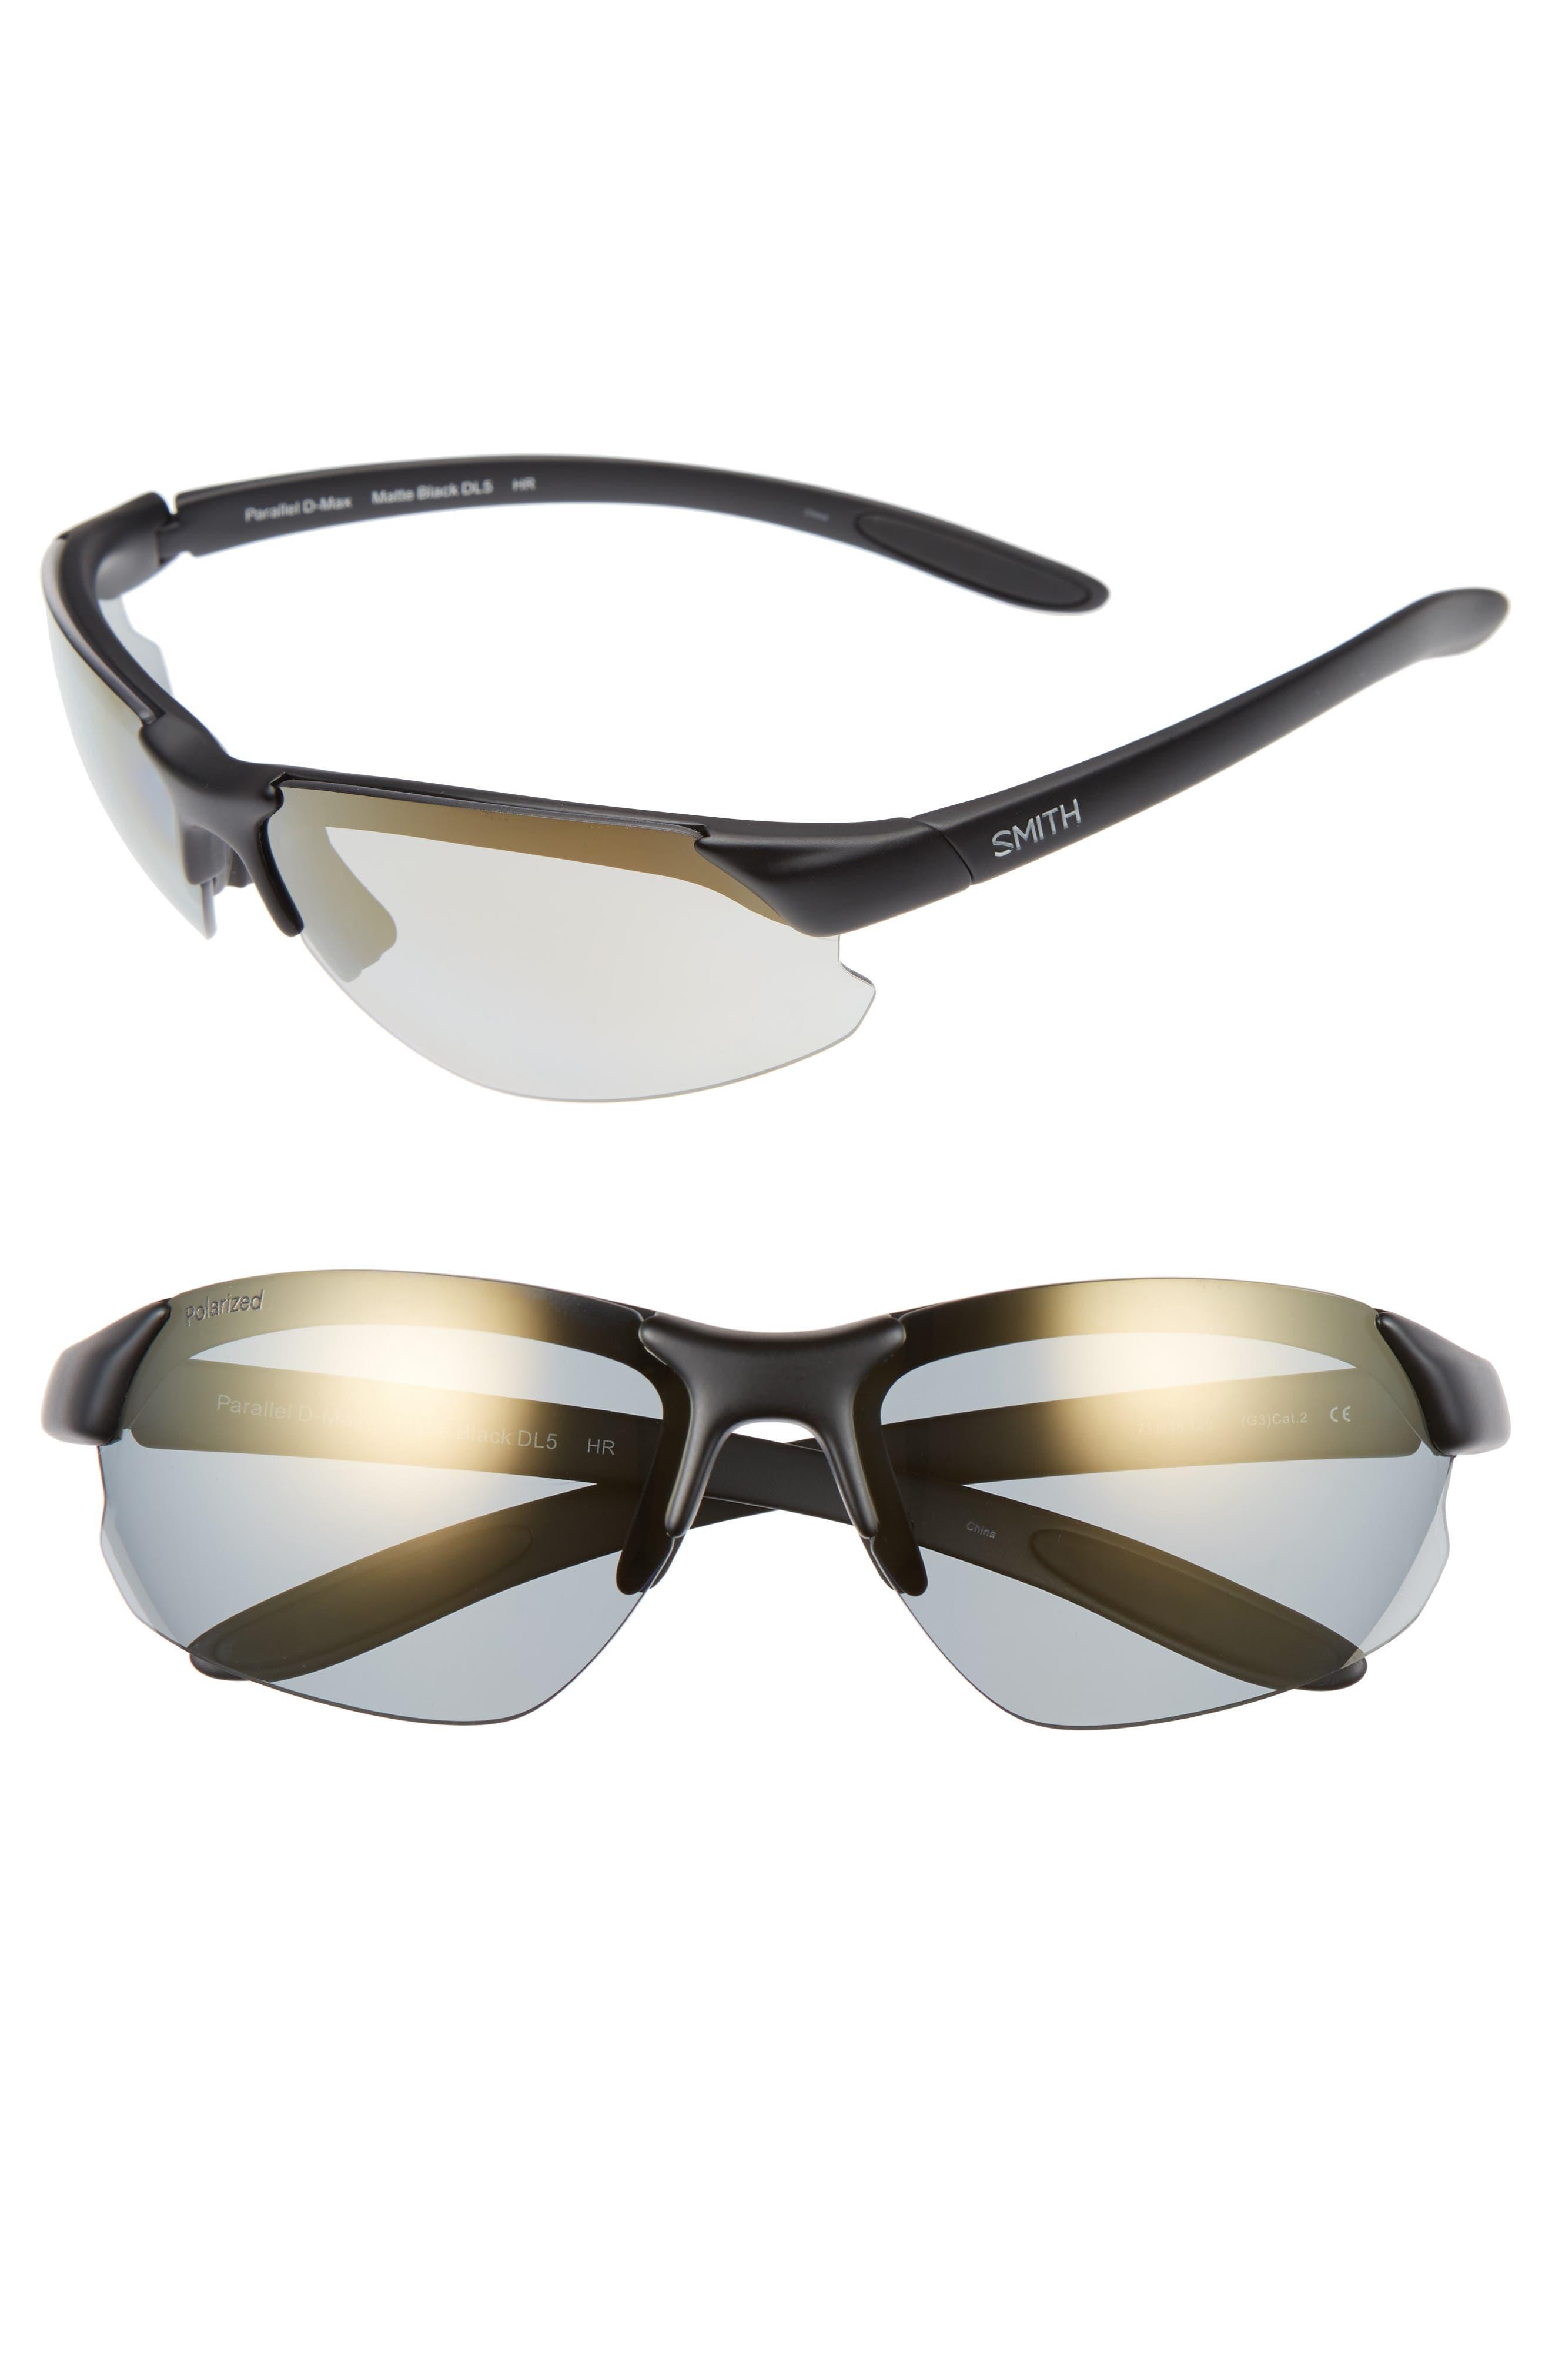 Parallel Max 69mm Polarized Sunglasses,                             Main thumbnail 1, color,                             001